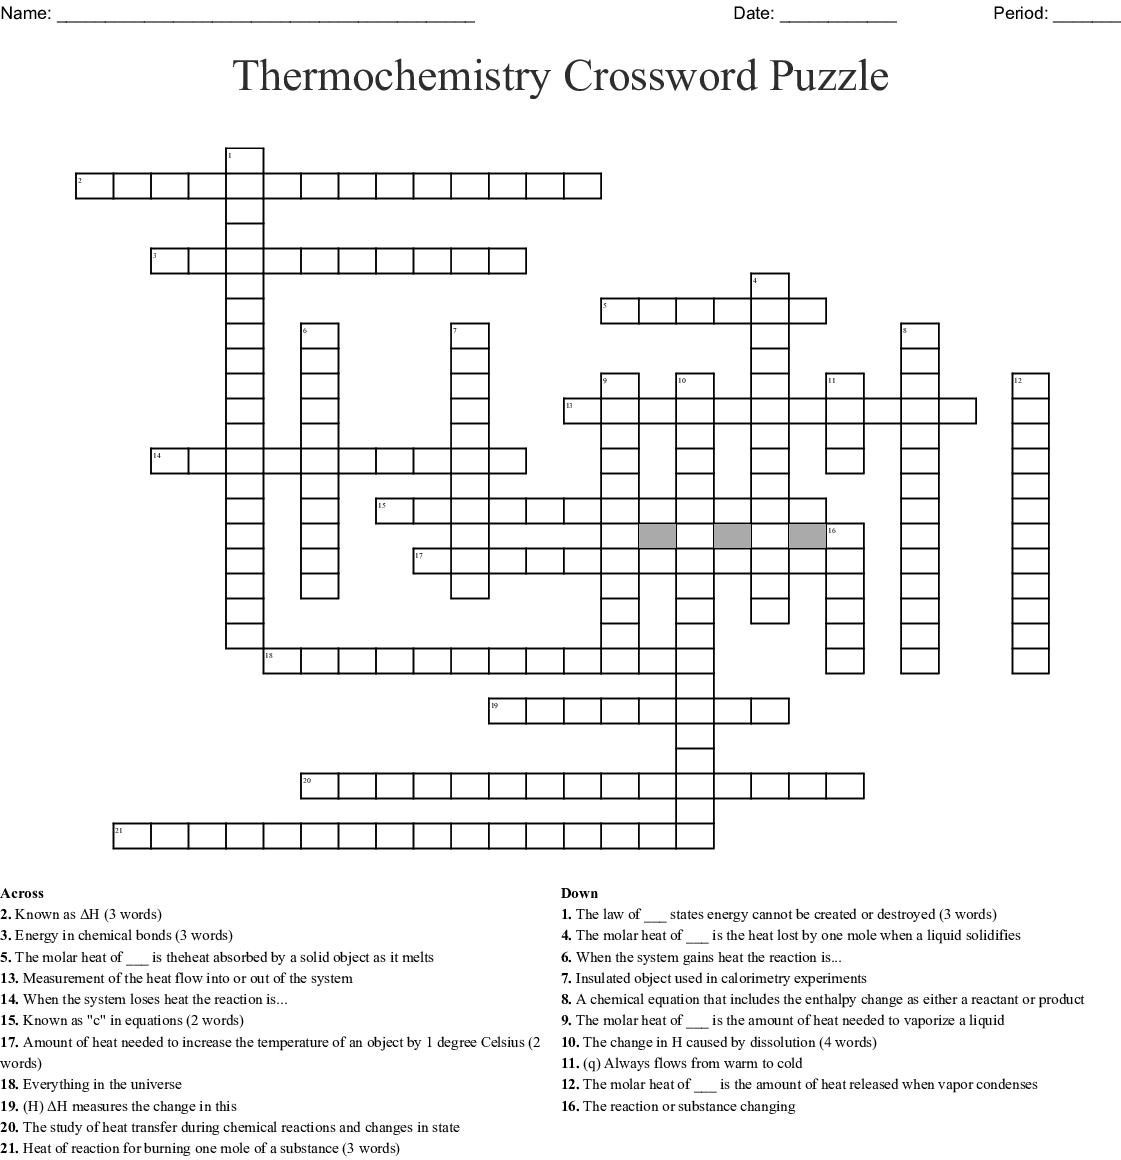 Thermochemistry Crossword Puzzle - WordMint